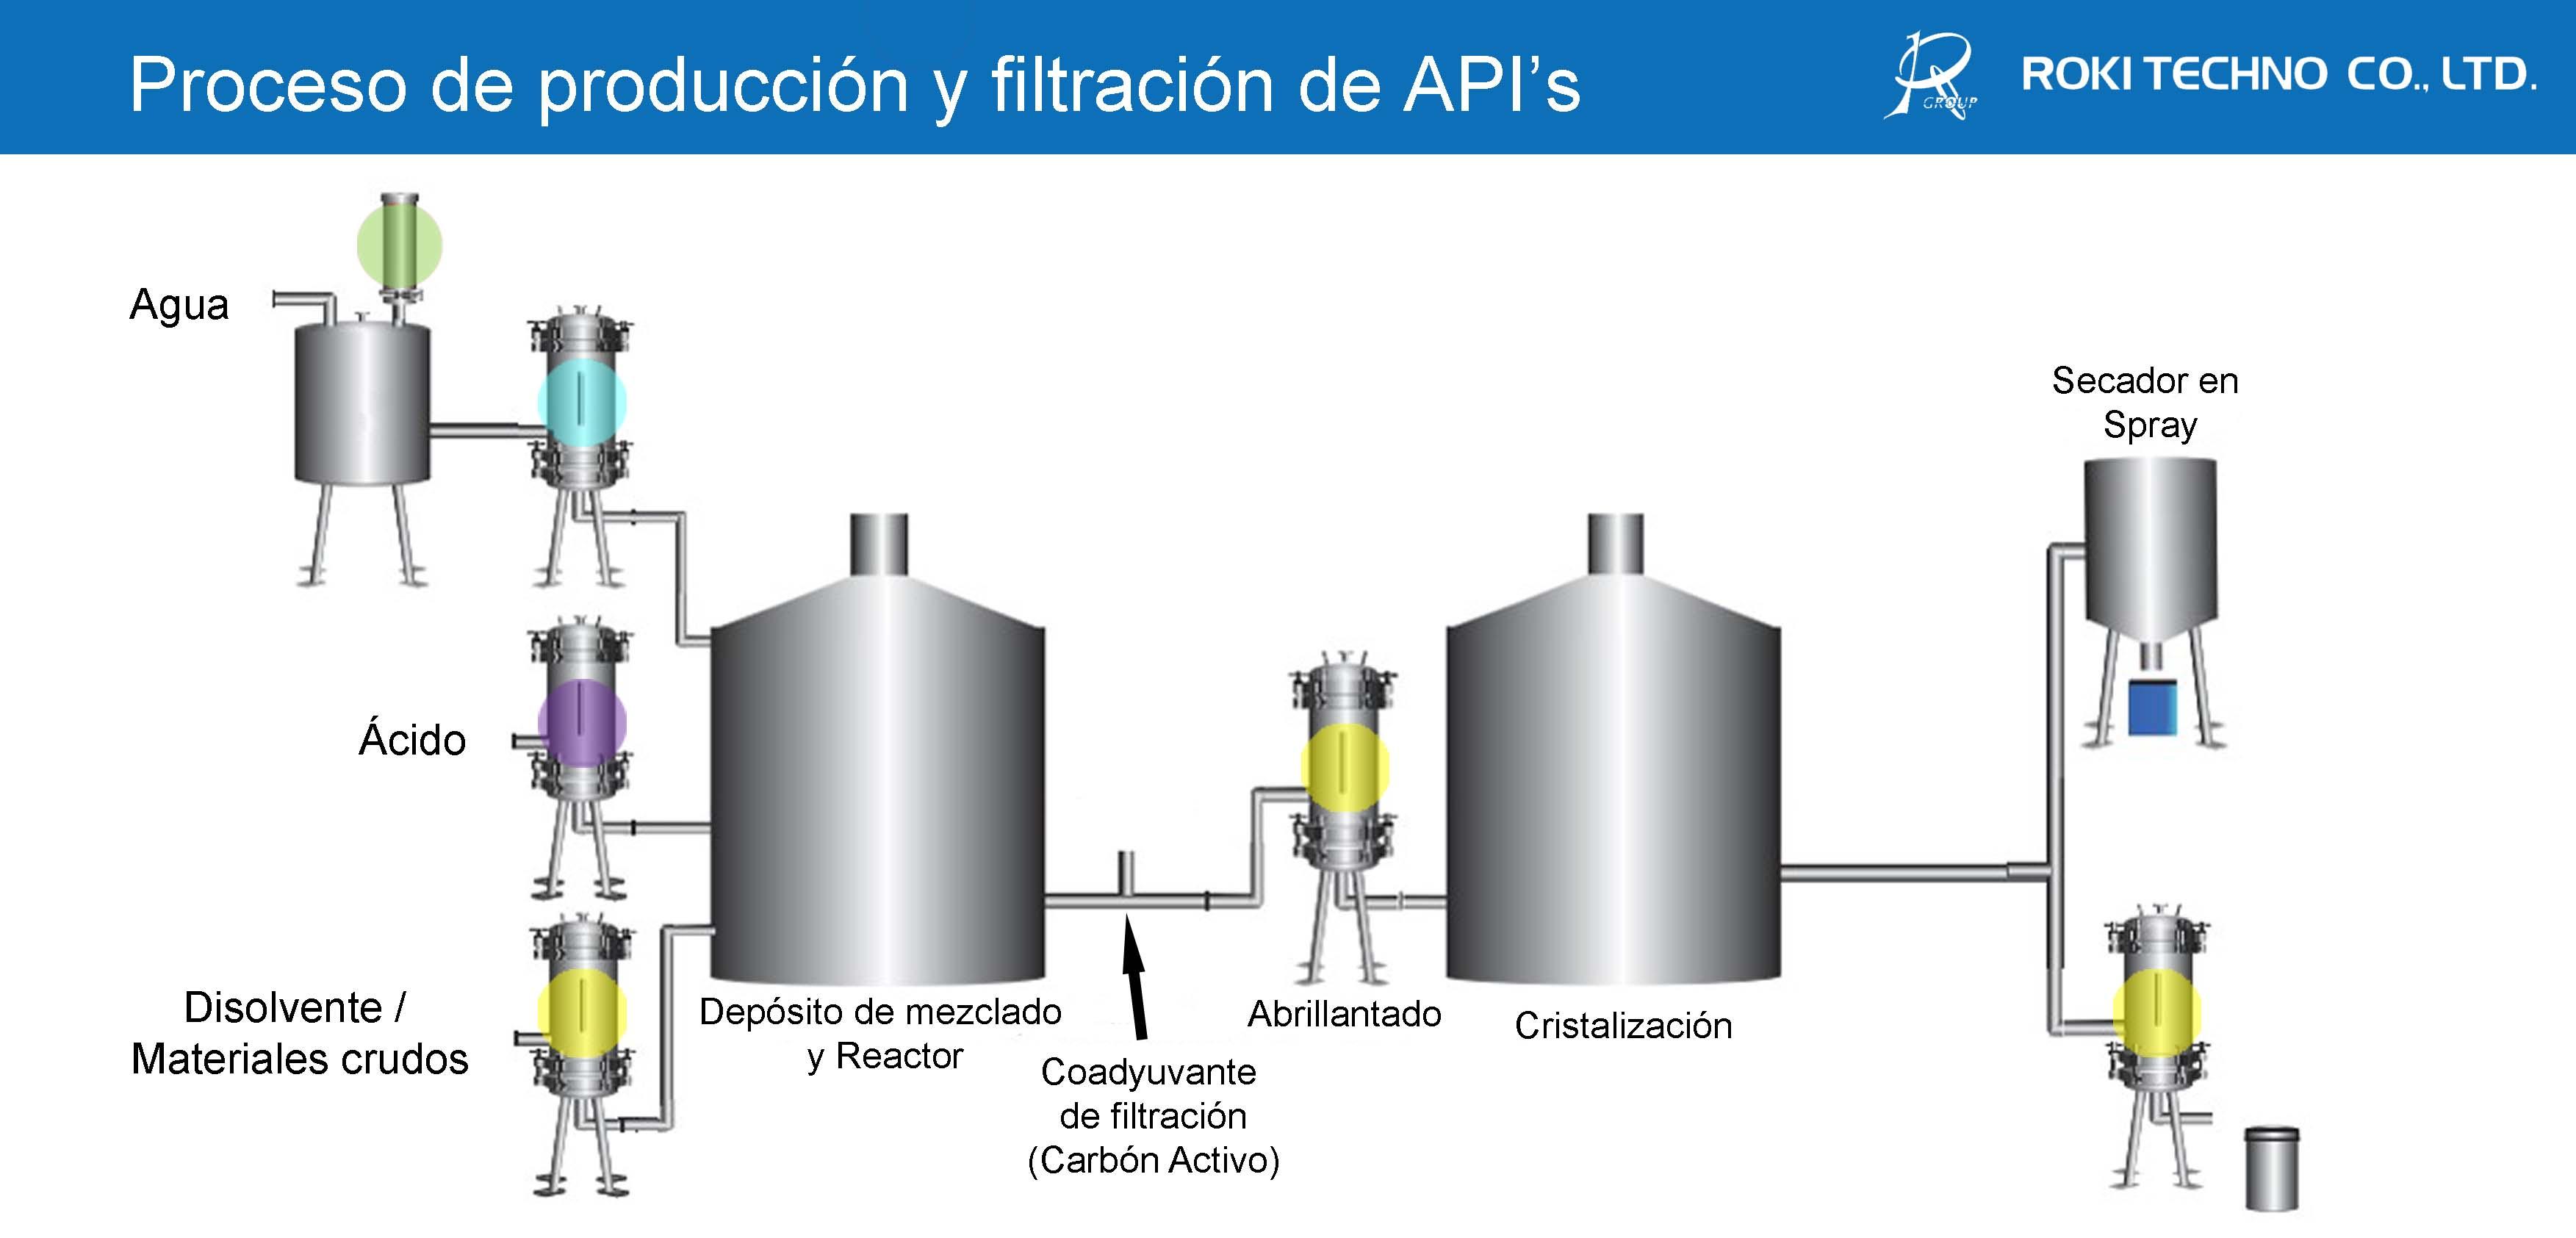 ⑤Beer process for EU(Pasteurized beer)